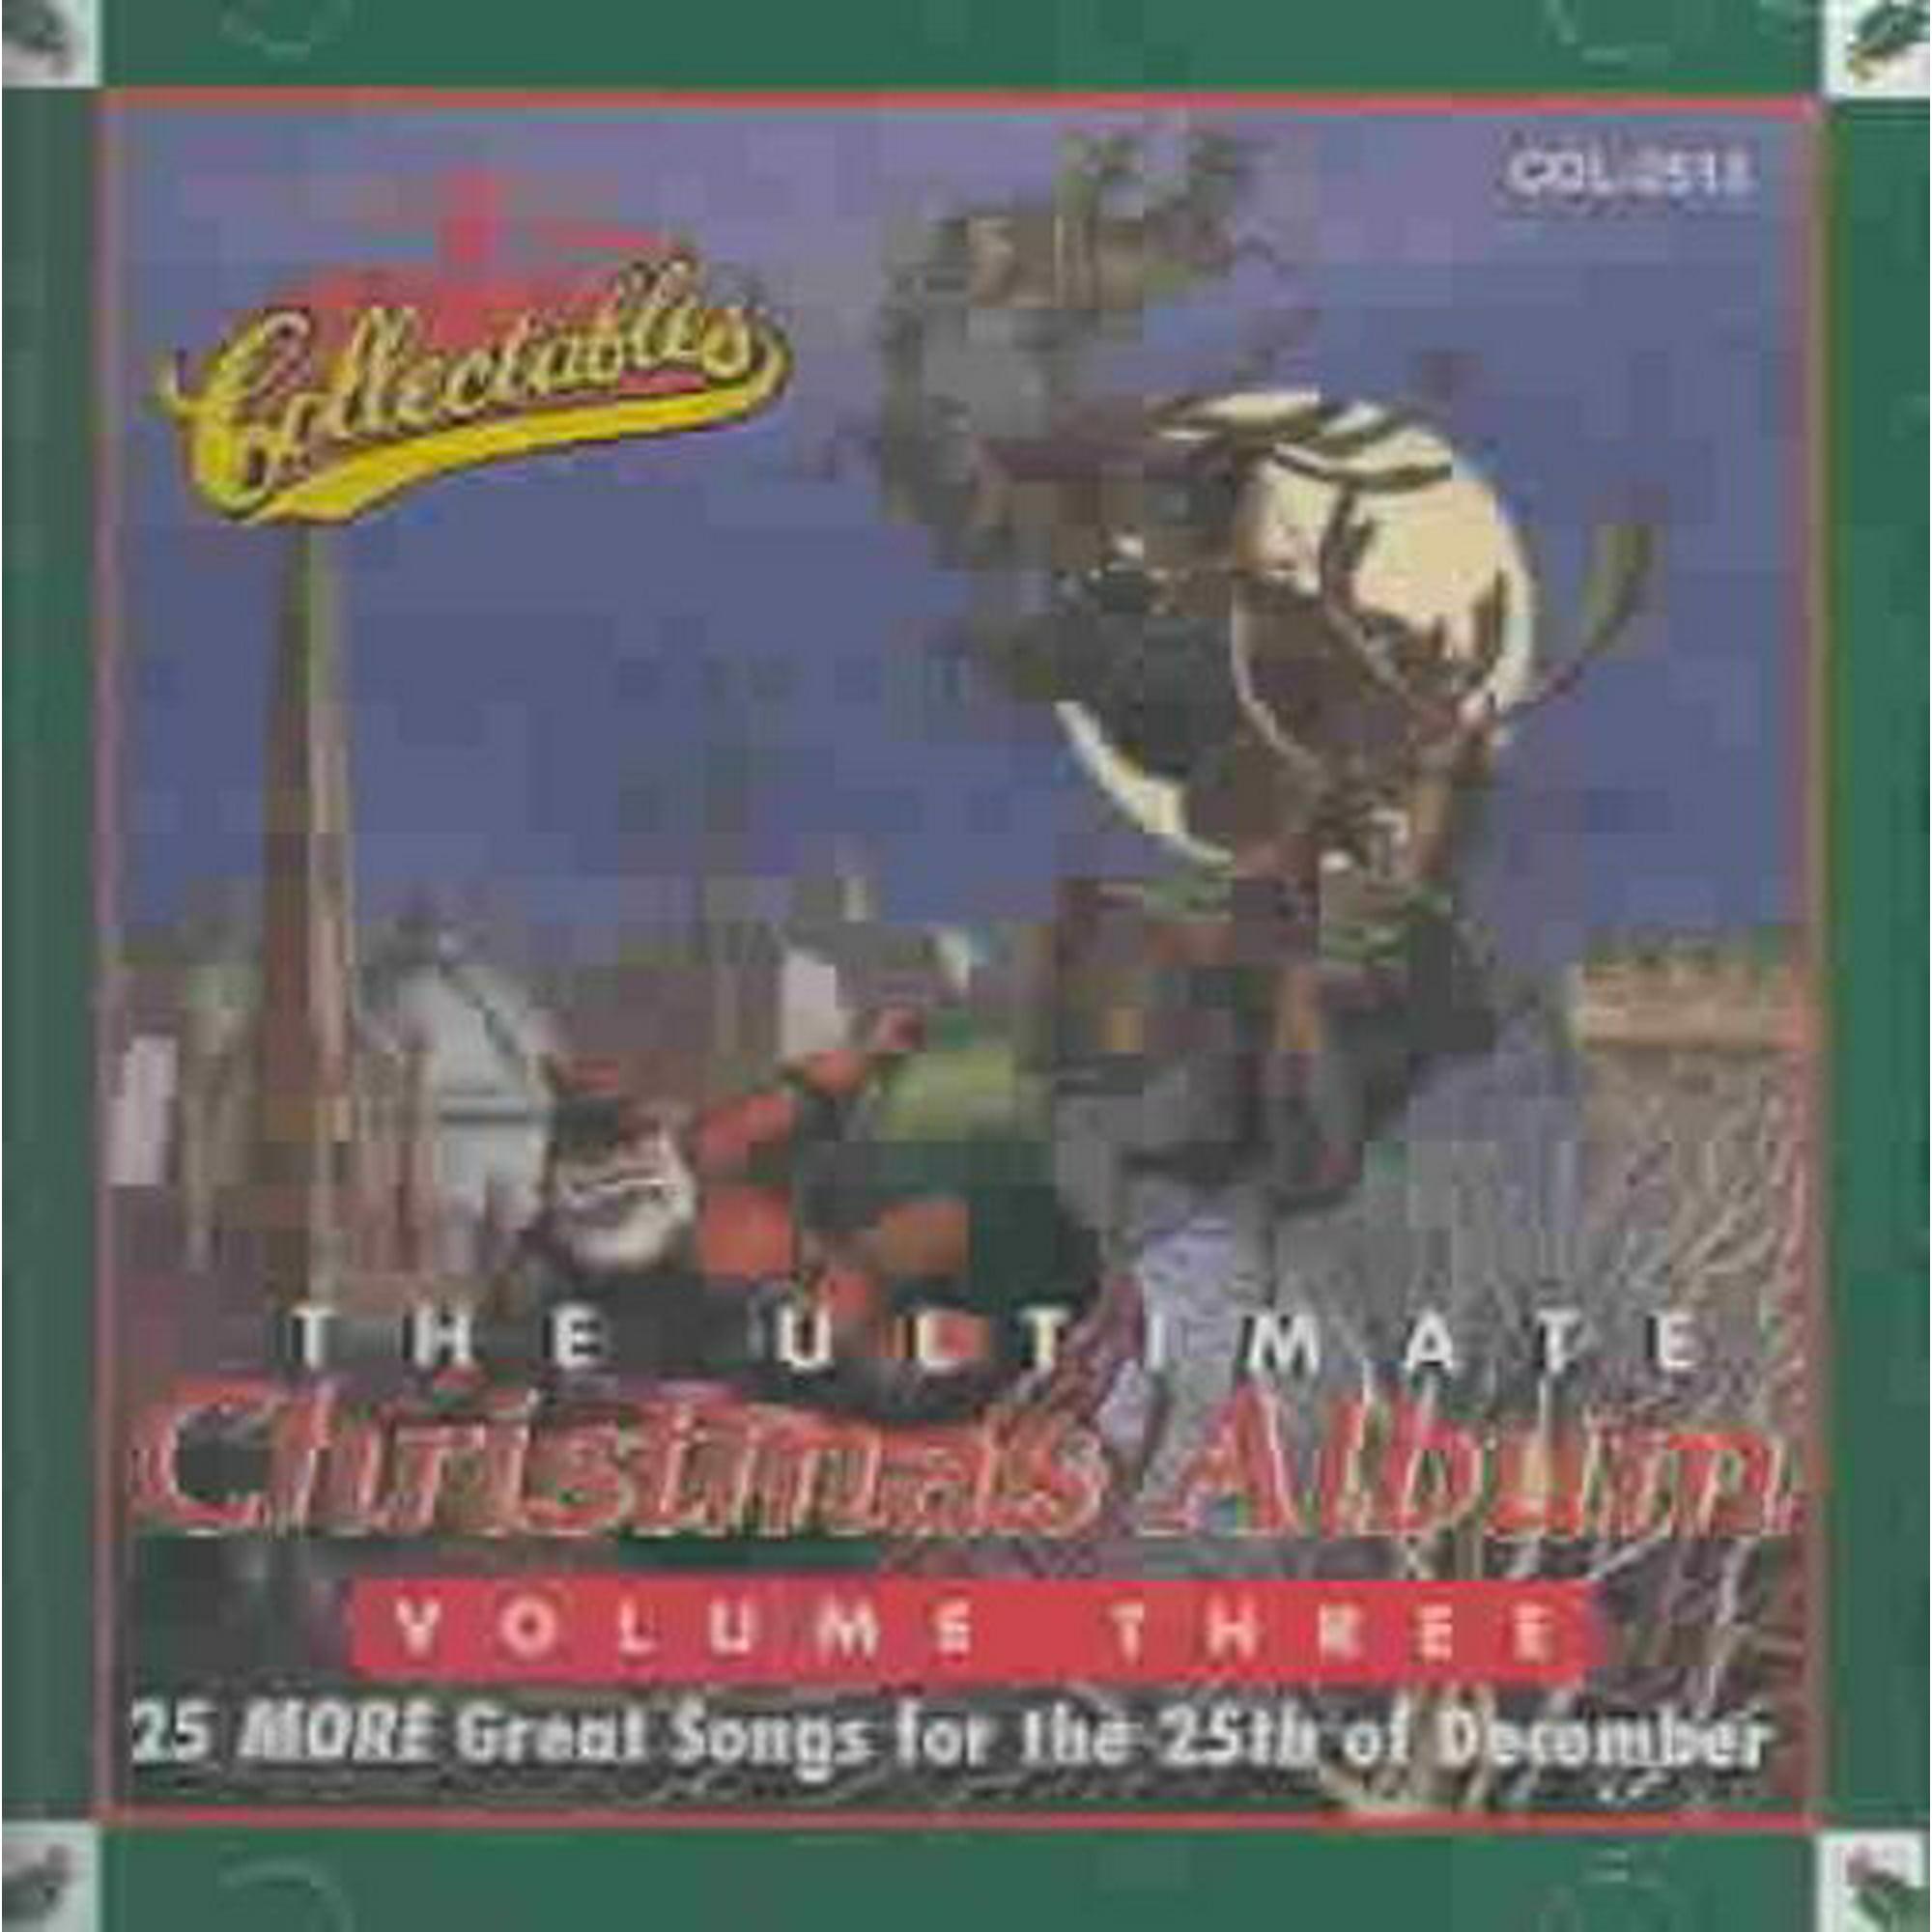 Chance Christmas Album.Various Artists The Ultimate Christmas Album Vol 3 Cd